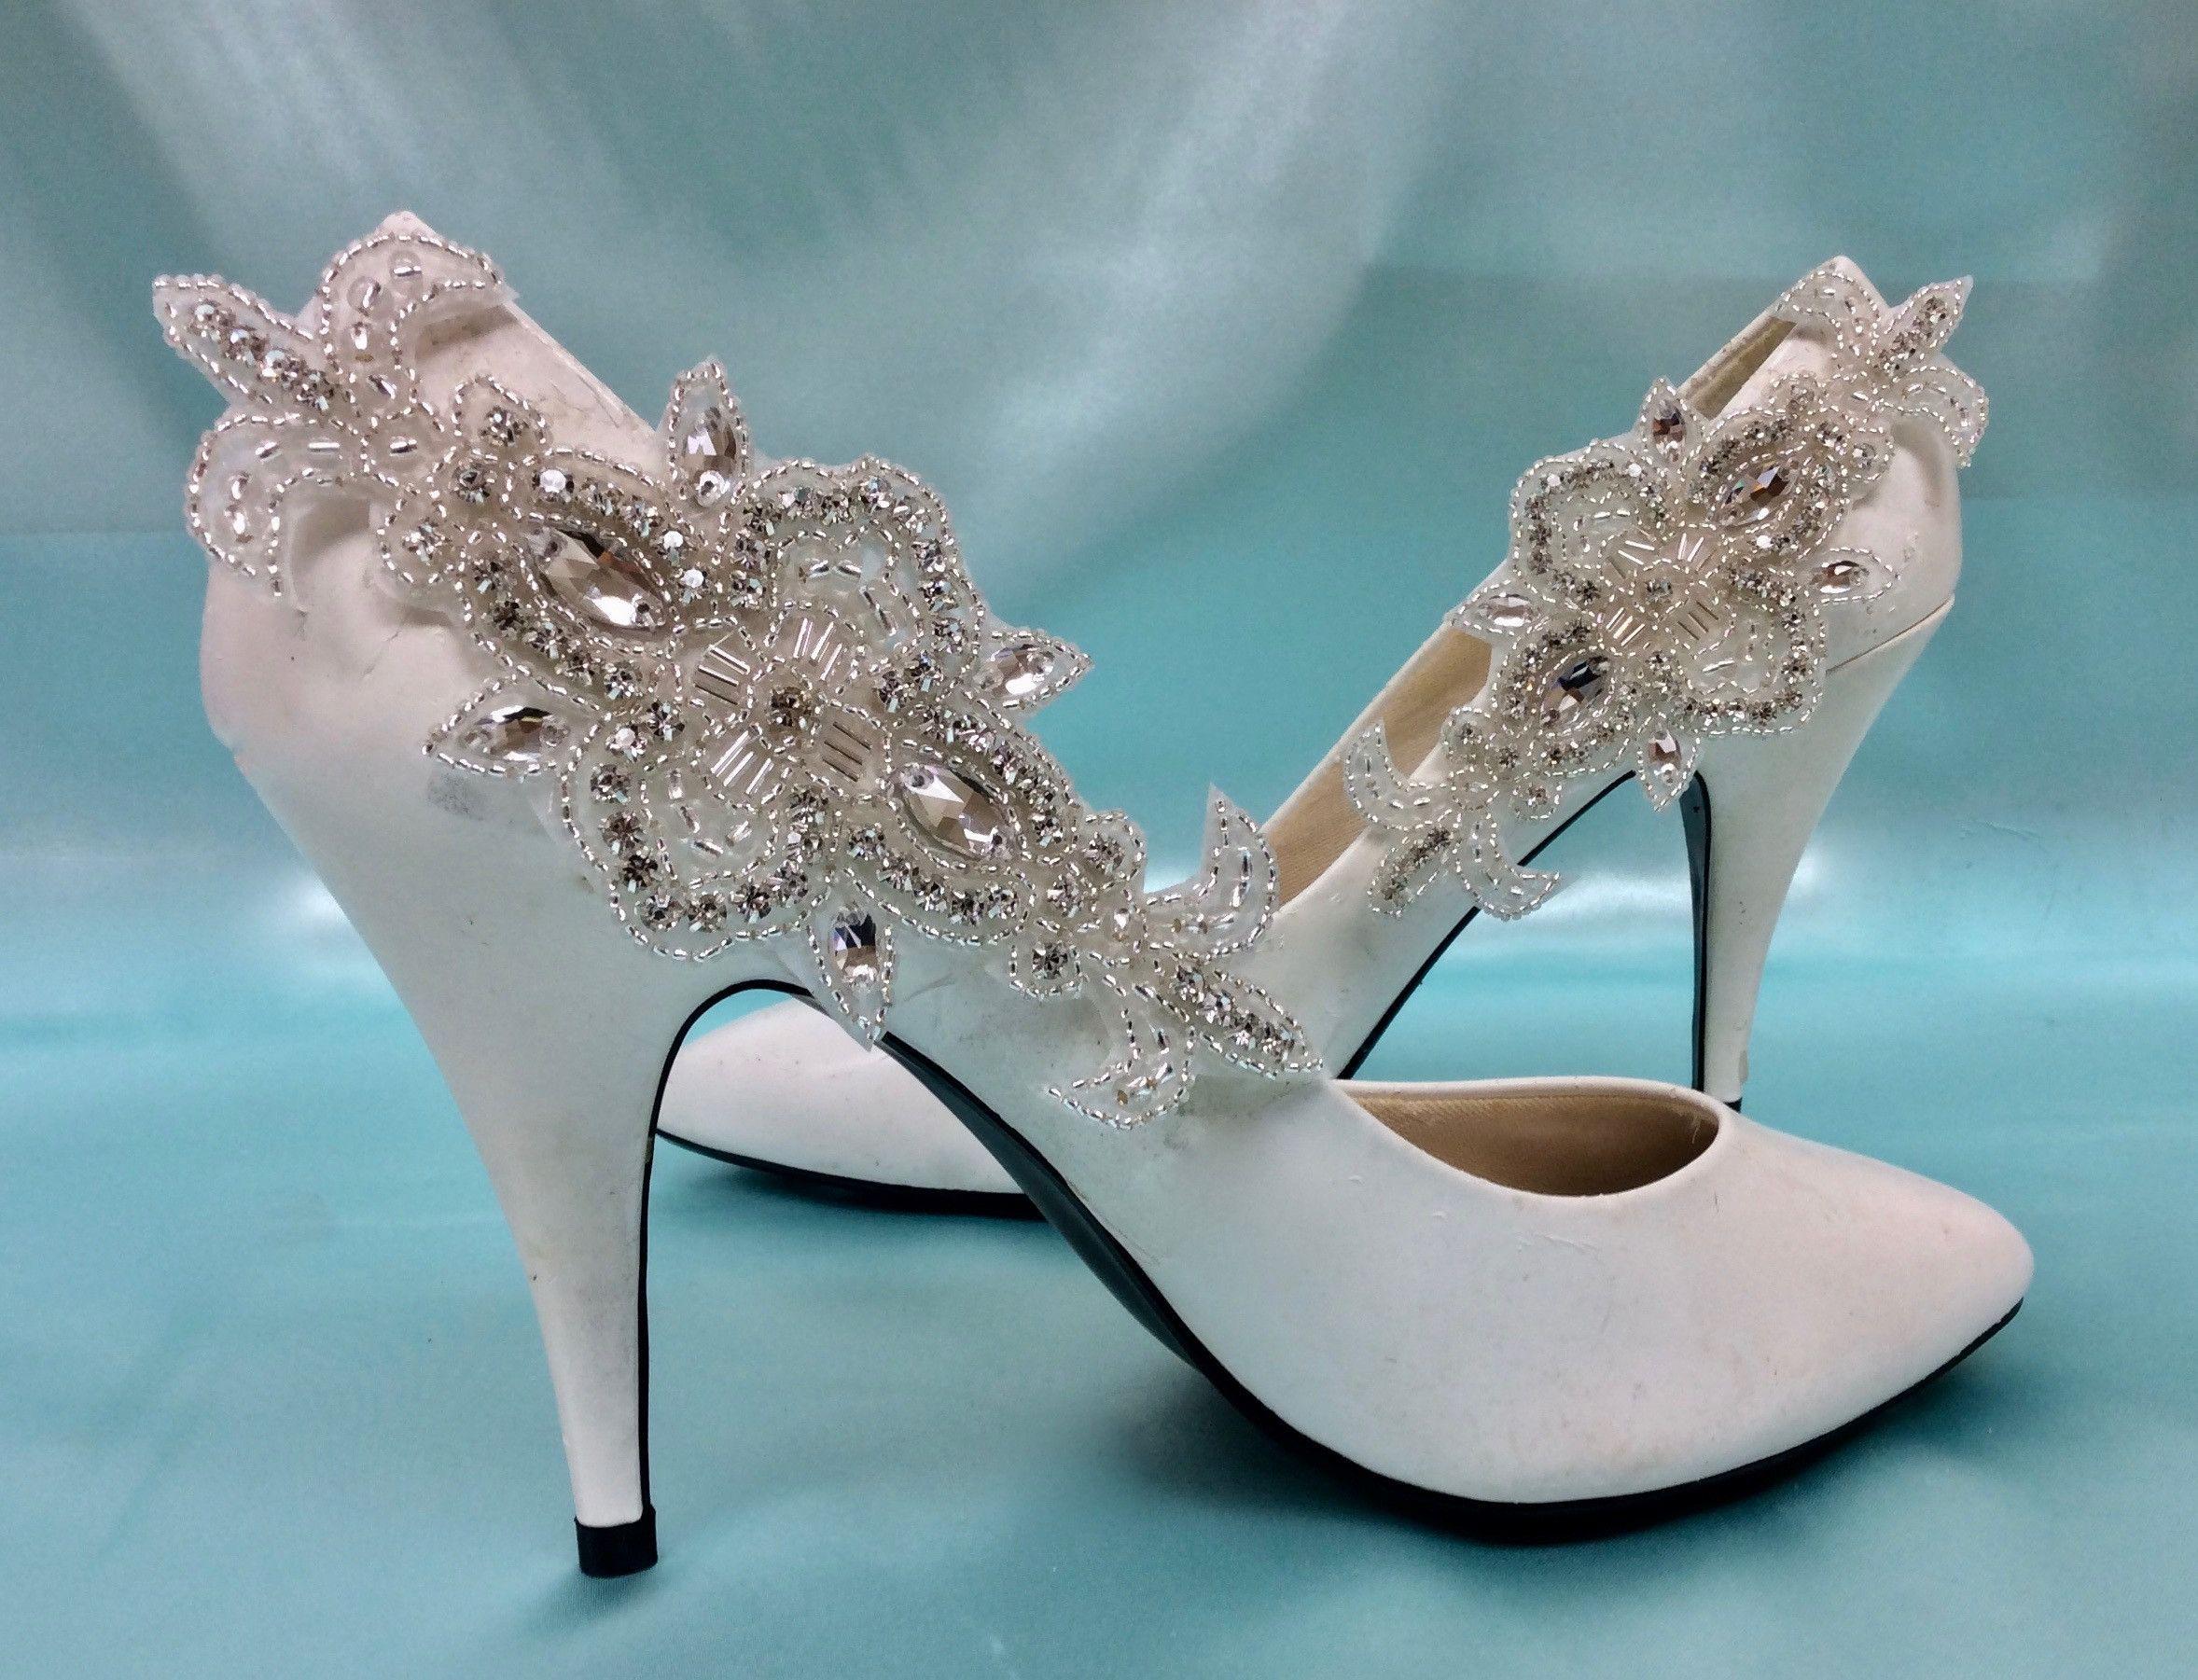 Red dress shoes for wedding  Bridal Wedding Shoe Clips Rhinestone Crystal Shoe Accessory